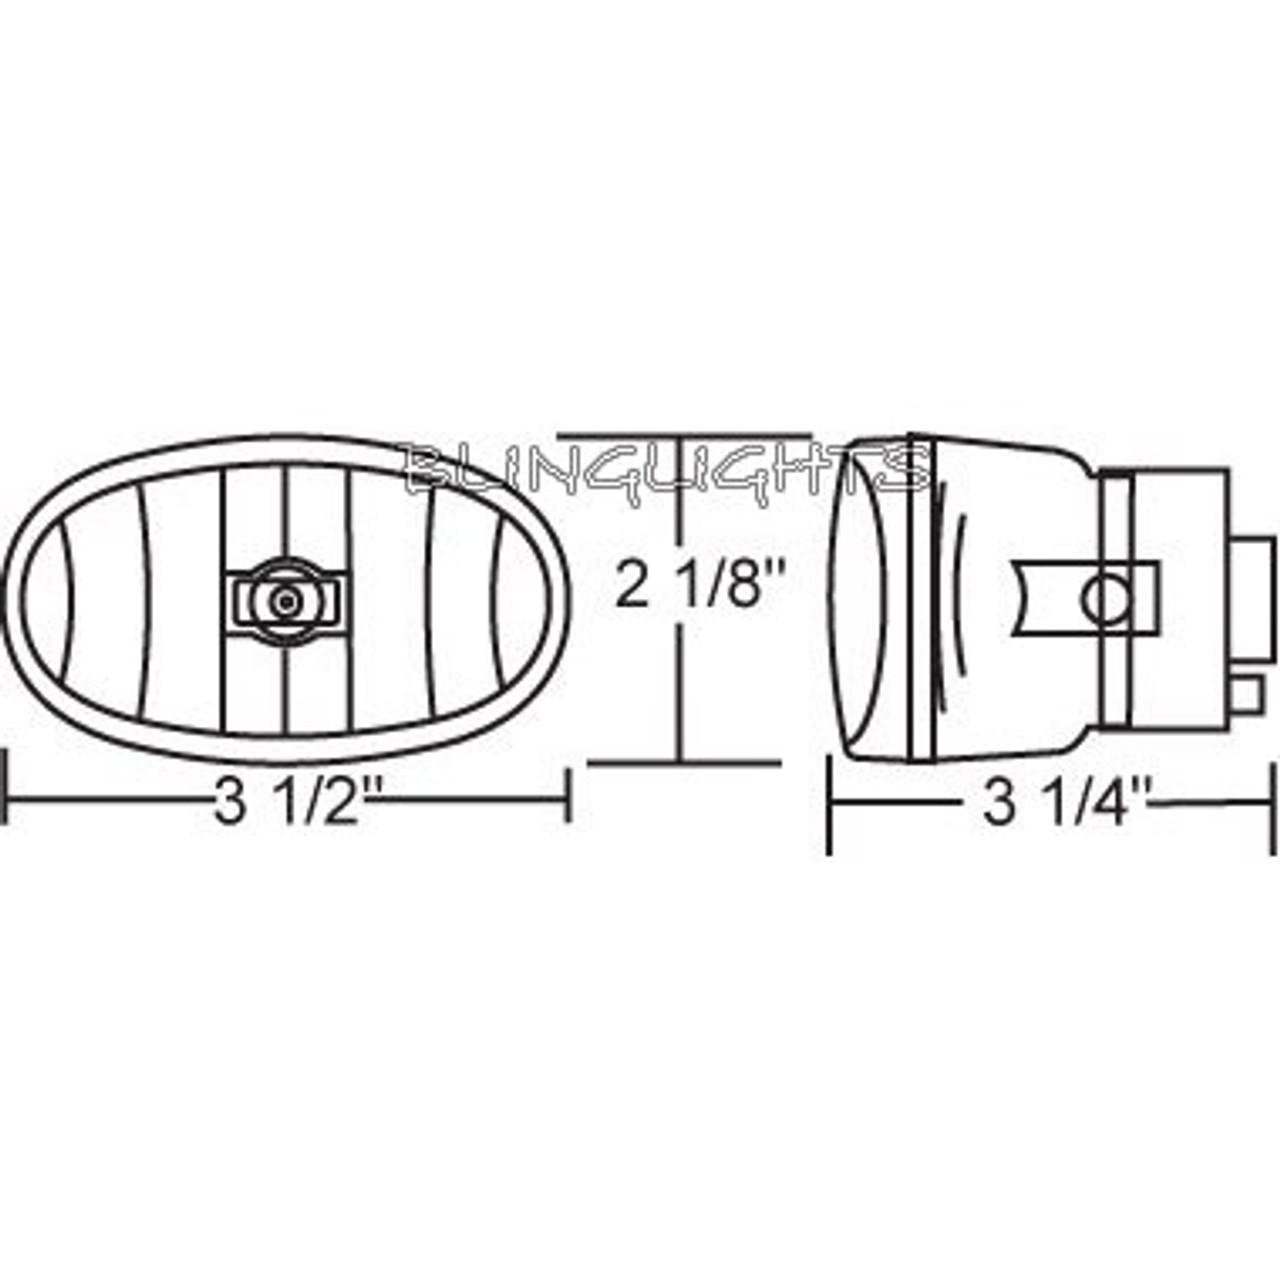 small resolution of yamaha tdm 850 wiring diagram wiring diagramyamaha tdm 850 wiring diagram